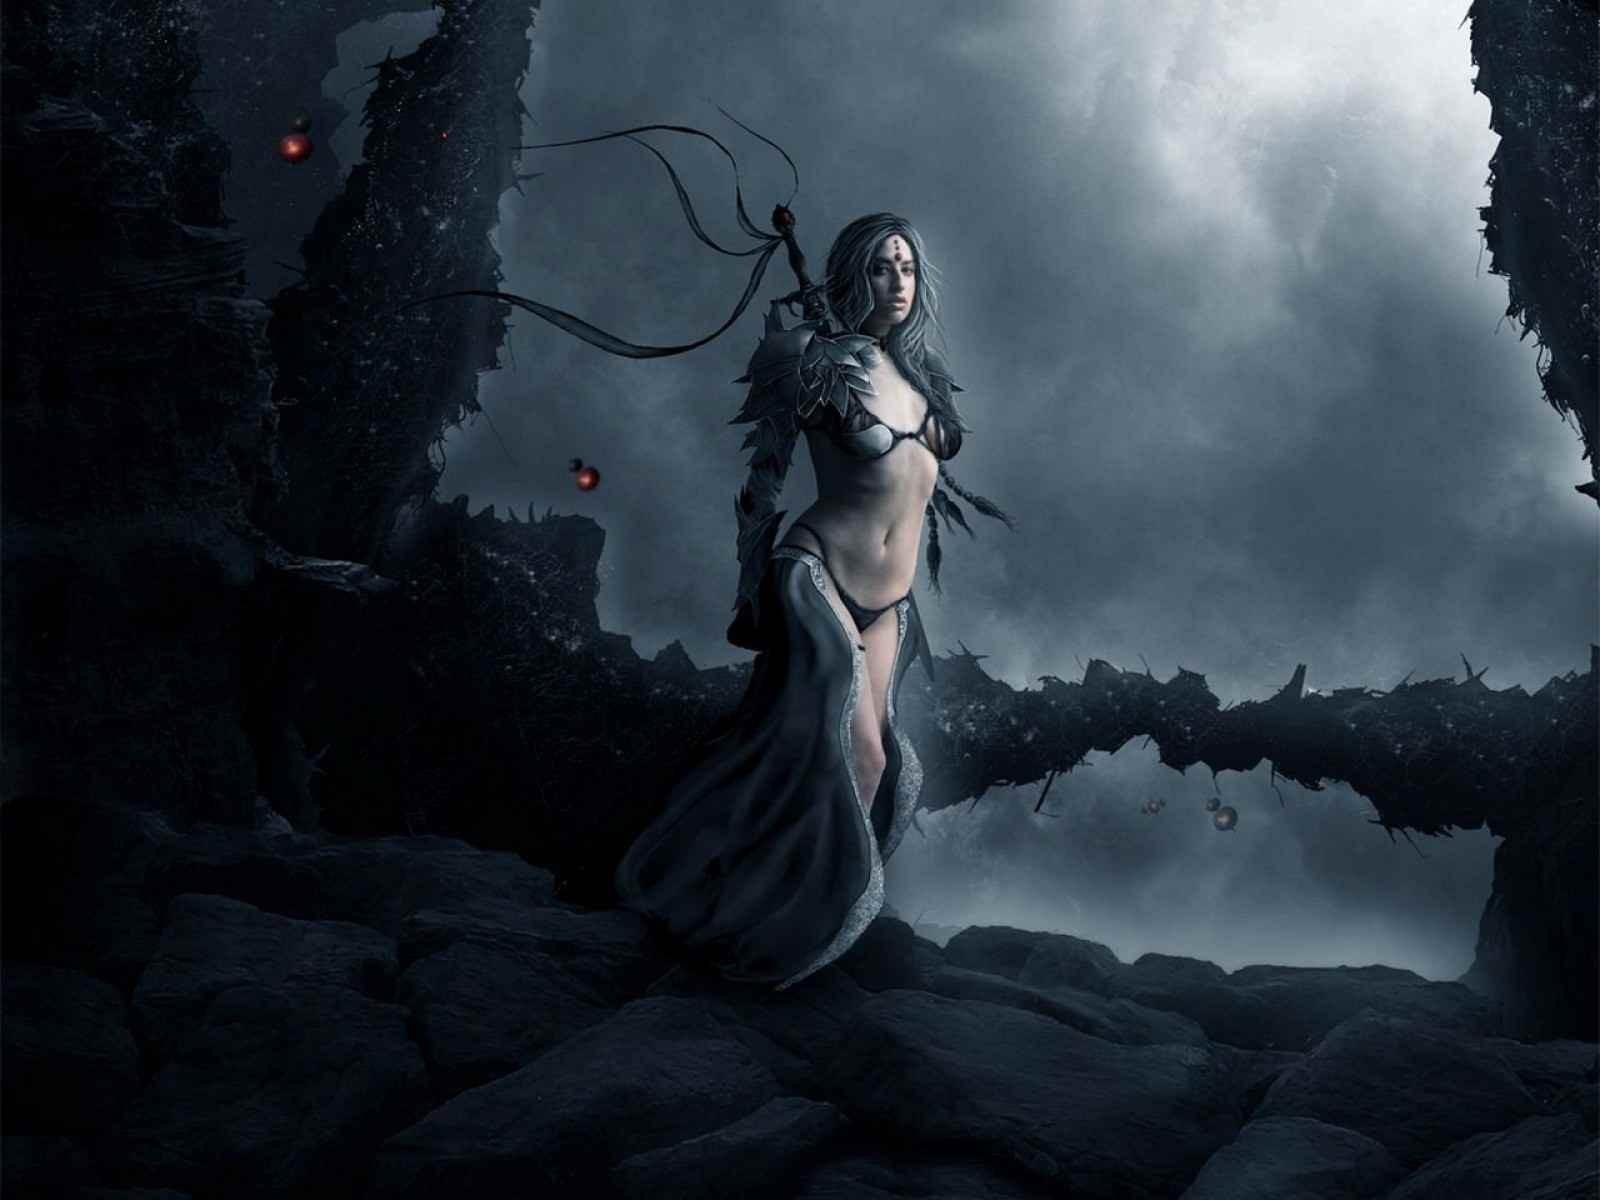 Wallpaper : Fantasy Art, Dark, Artwork, Warrior, Mythology